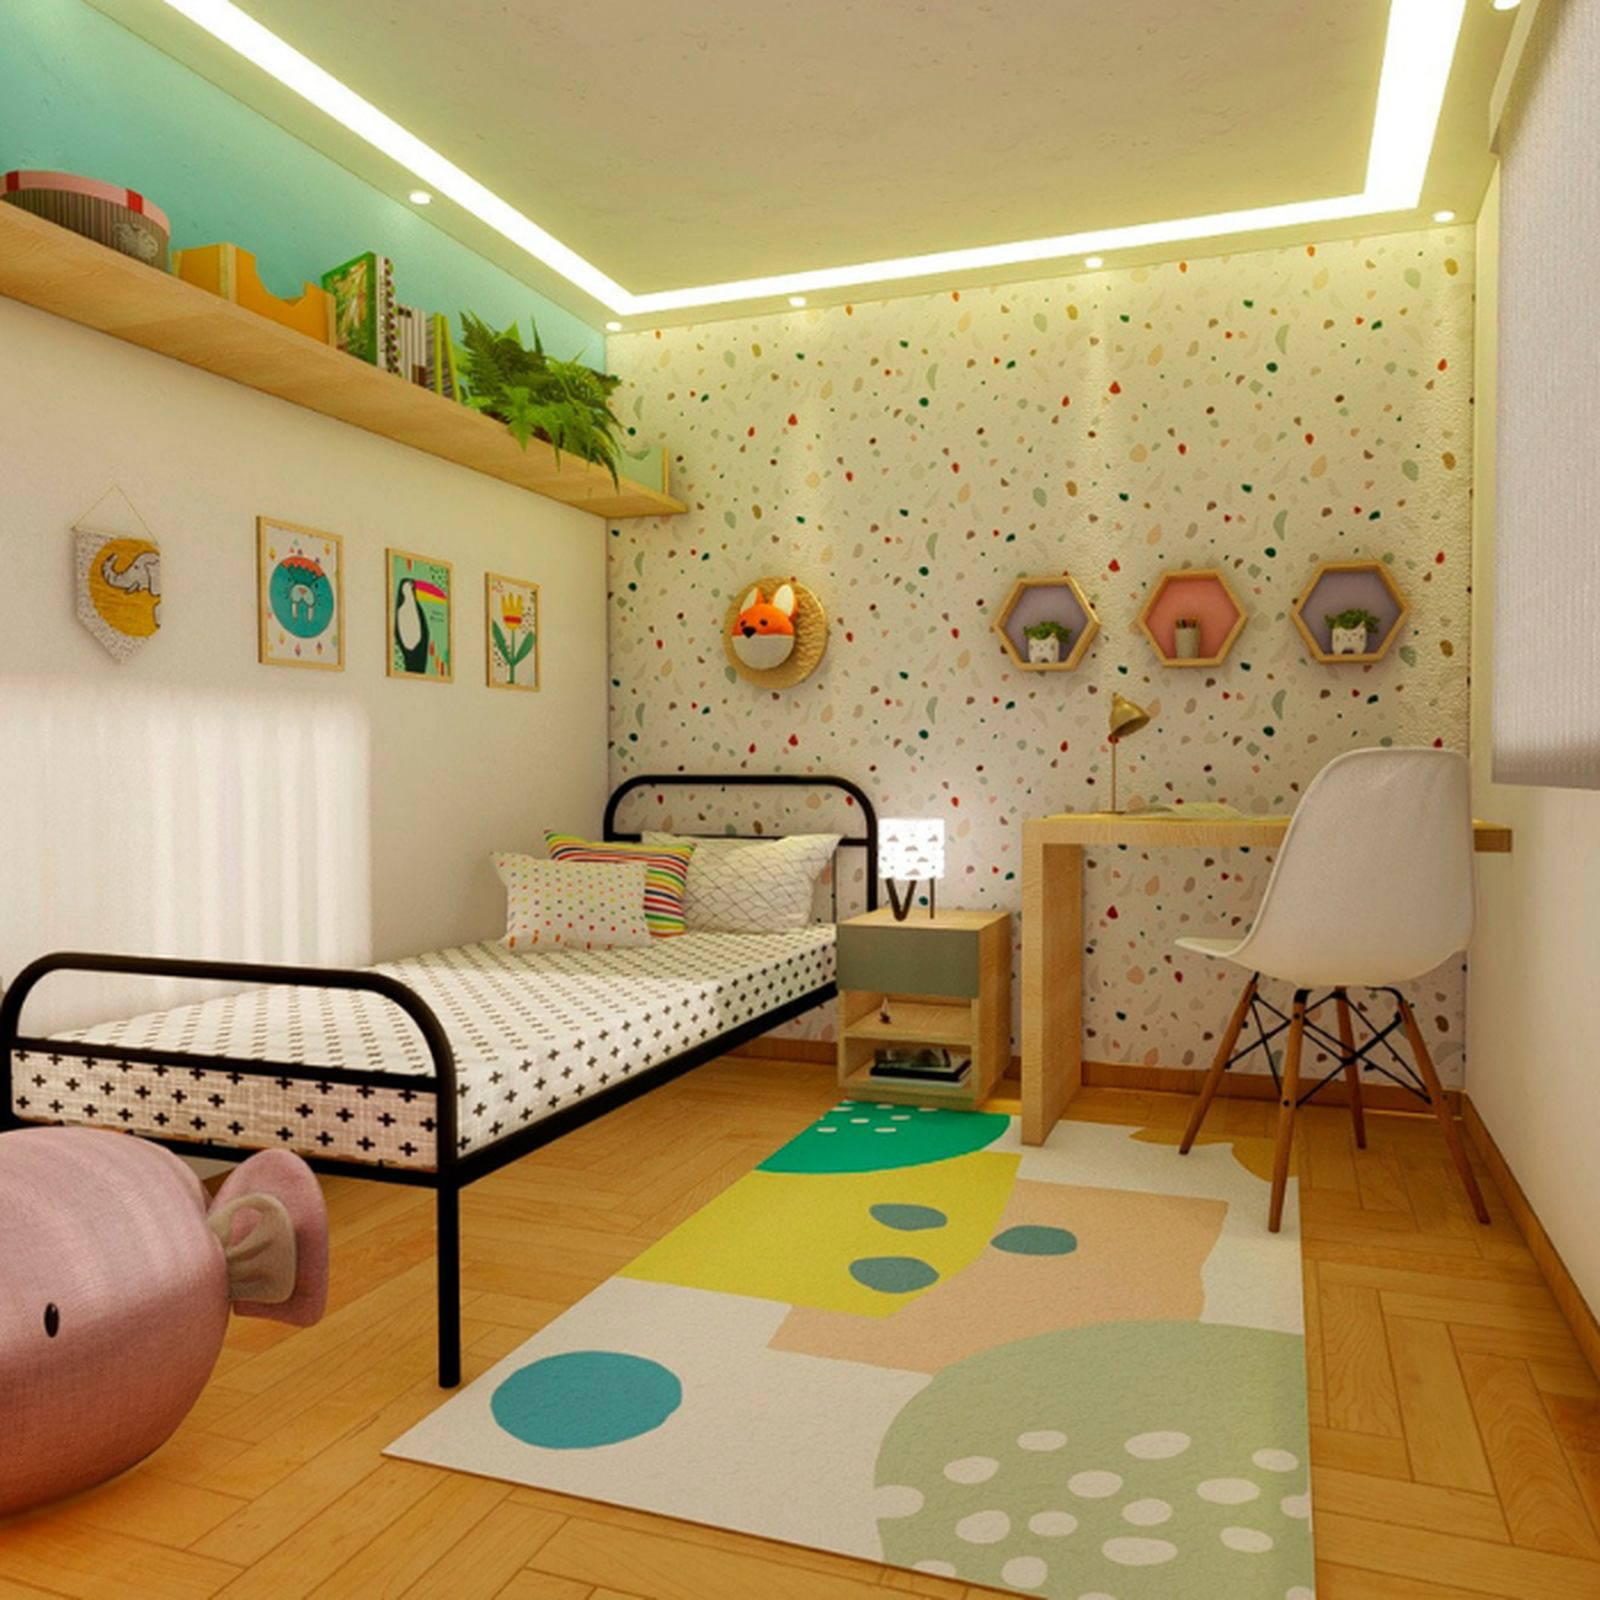 Tapete quarto infantil estampa Natureza  - Pomelo Decor